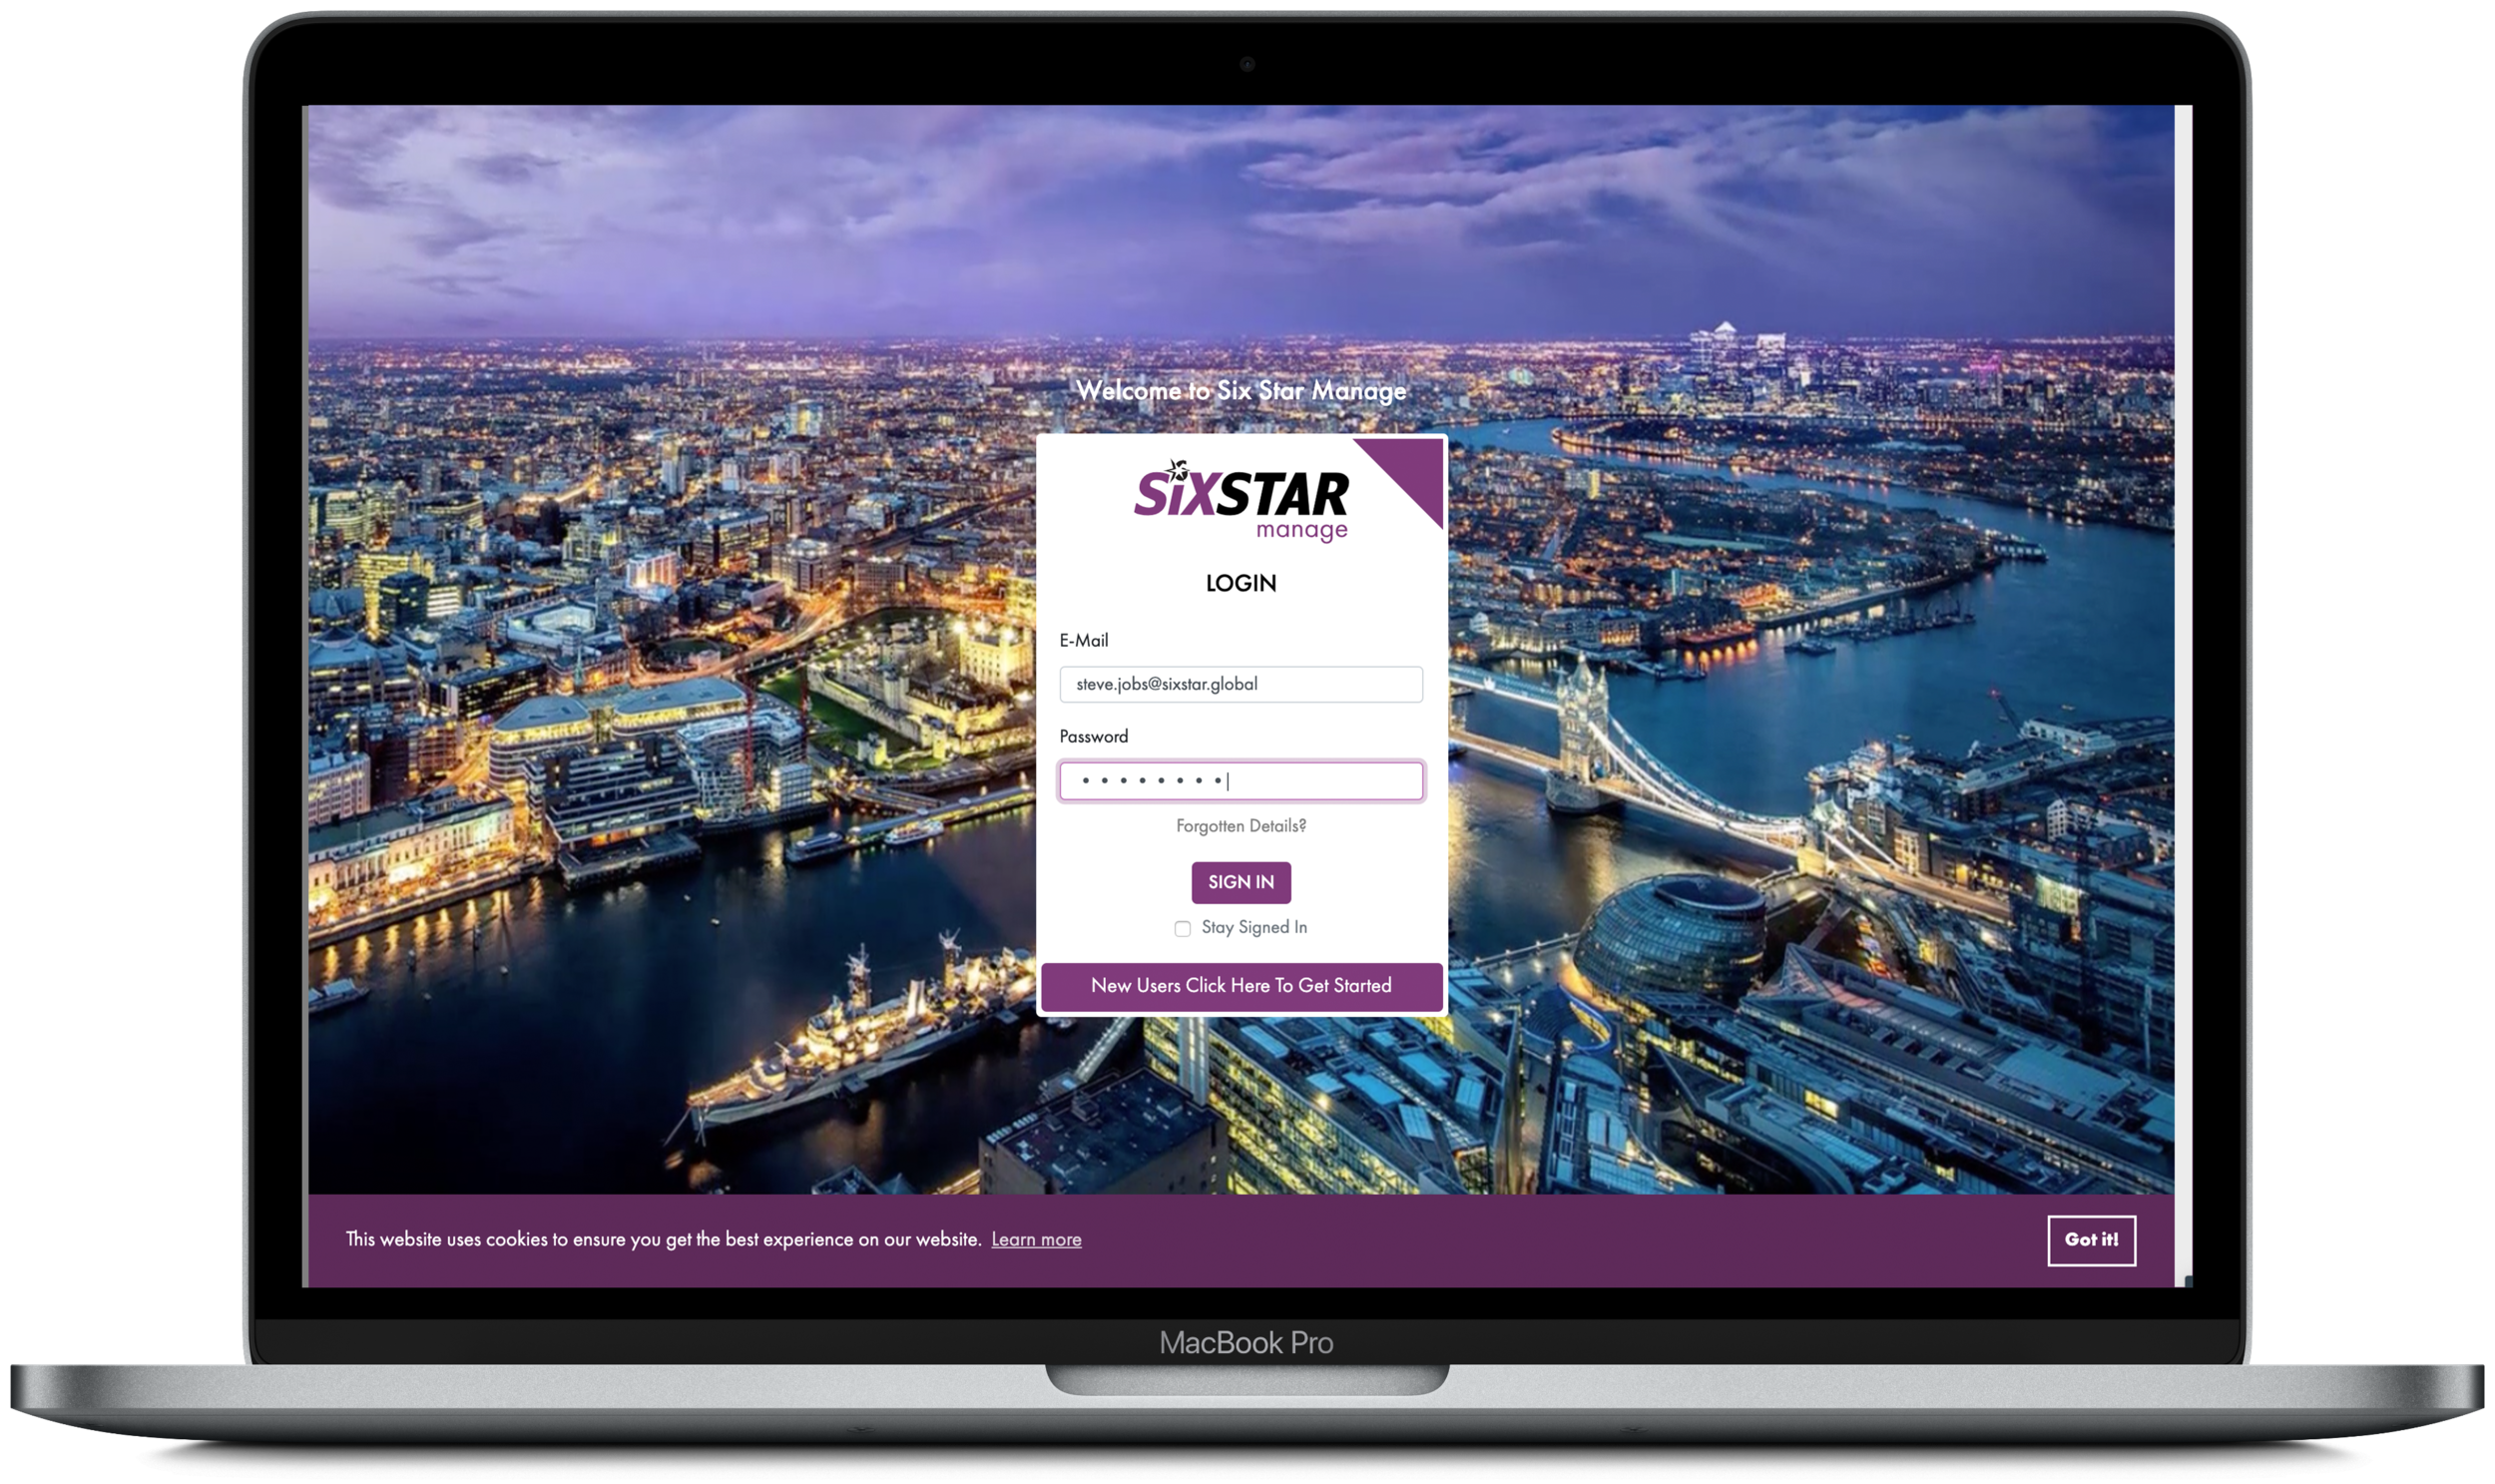 SIX STAR SUPPORT - 24/7 Management Portal